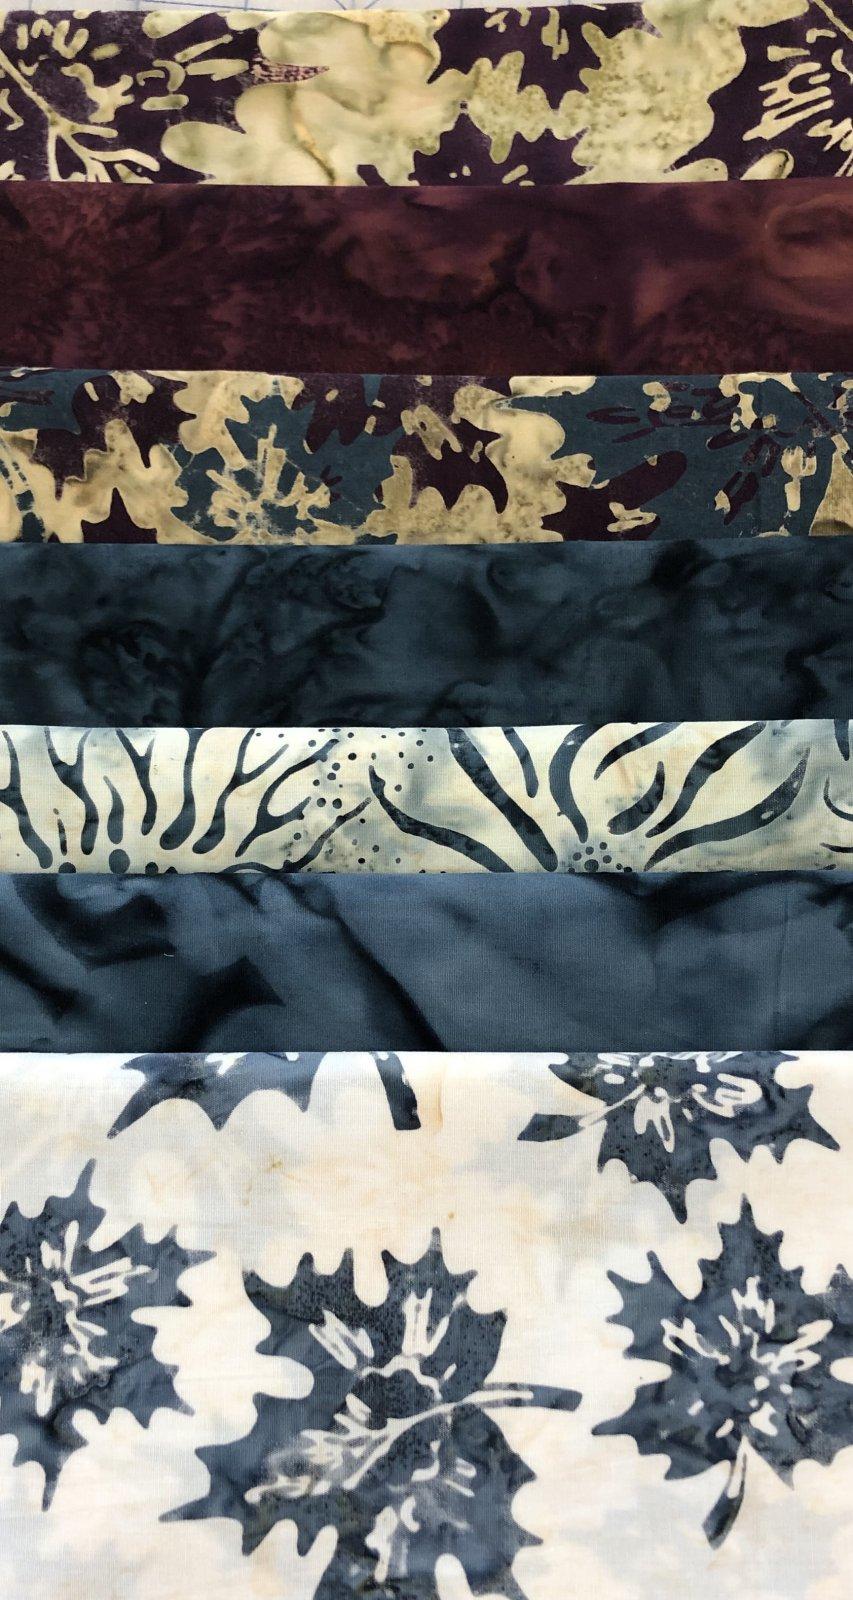 Batik Canadiana Fat 1/4 Bundle - 7 pc